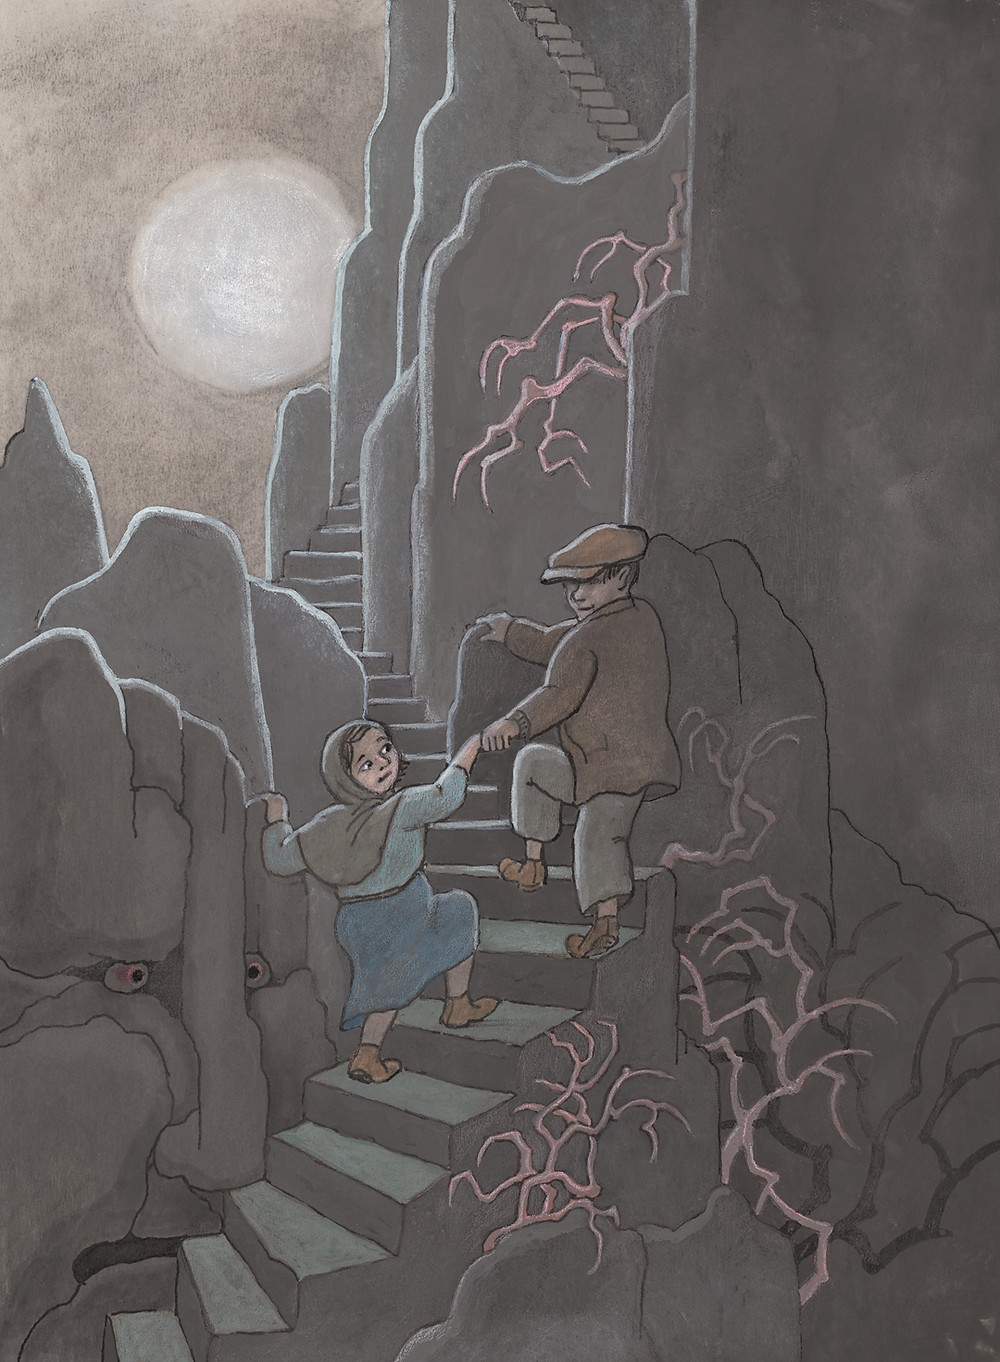 El Hombre Niebla. Il·lustració interior